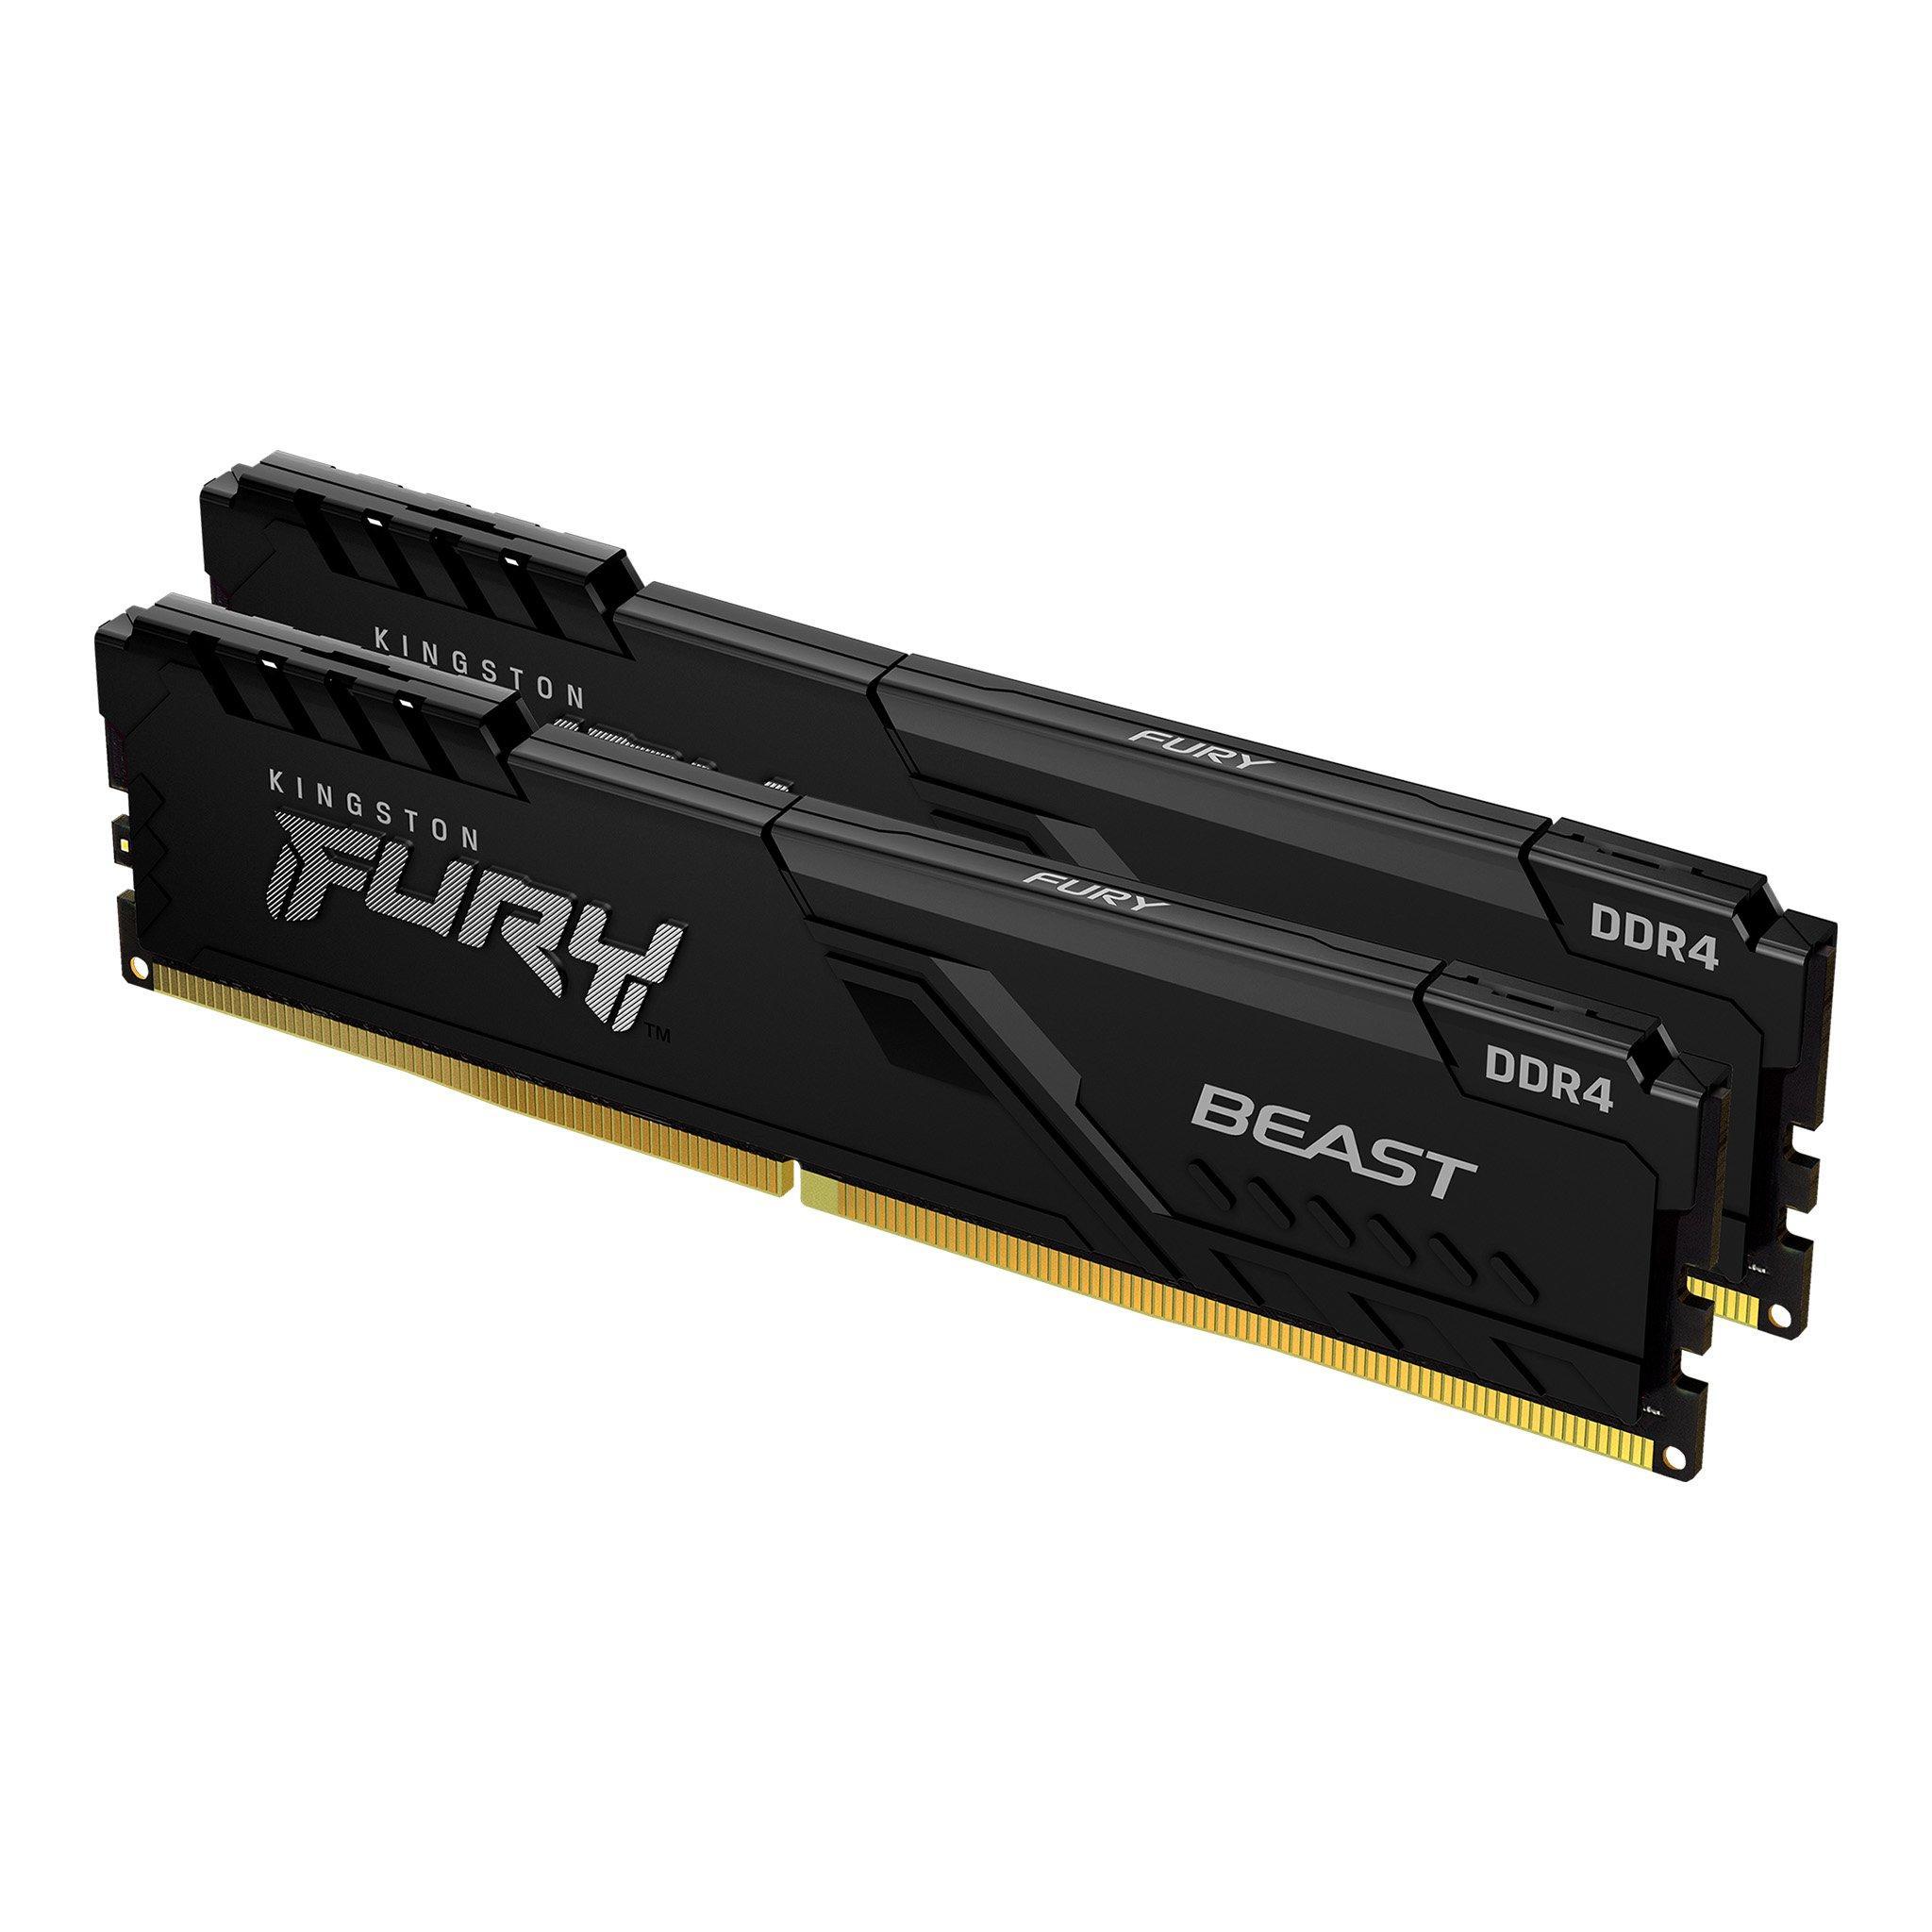 Памет Kingston FURY Beast Black 32GB(2x16GB) DDR4 PC4-21300 2666MHz CL16 KF426C16BB1K2/32